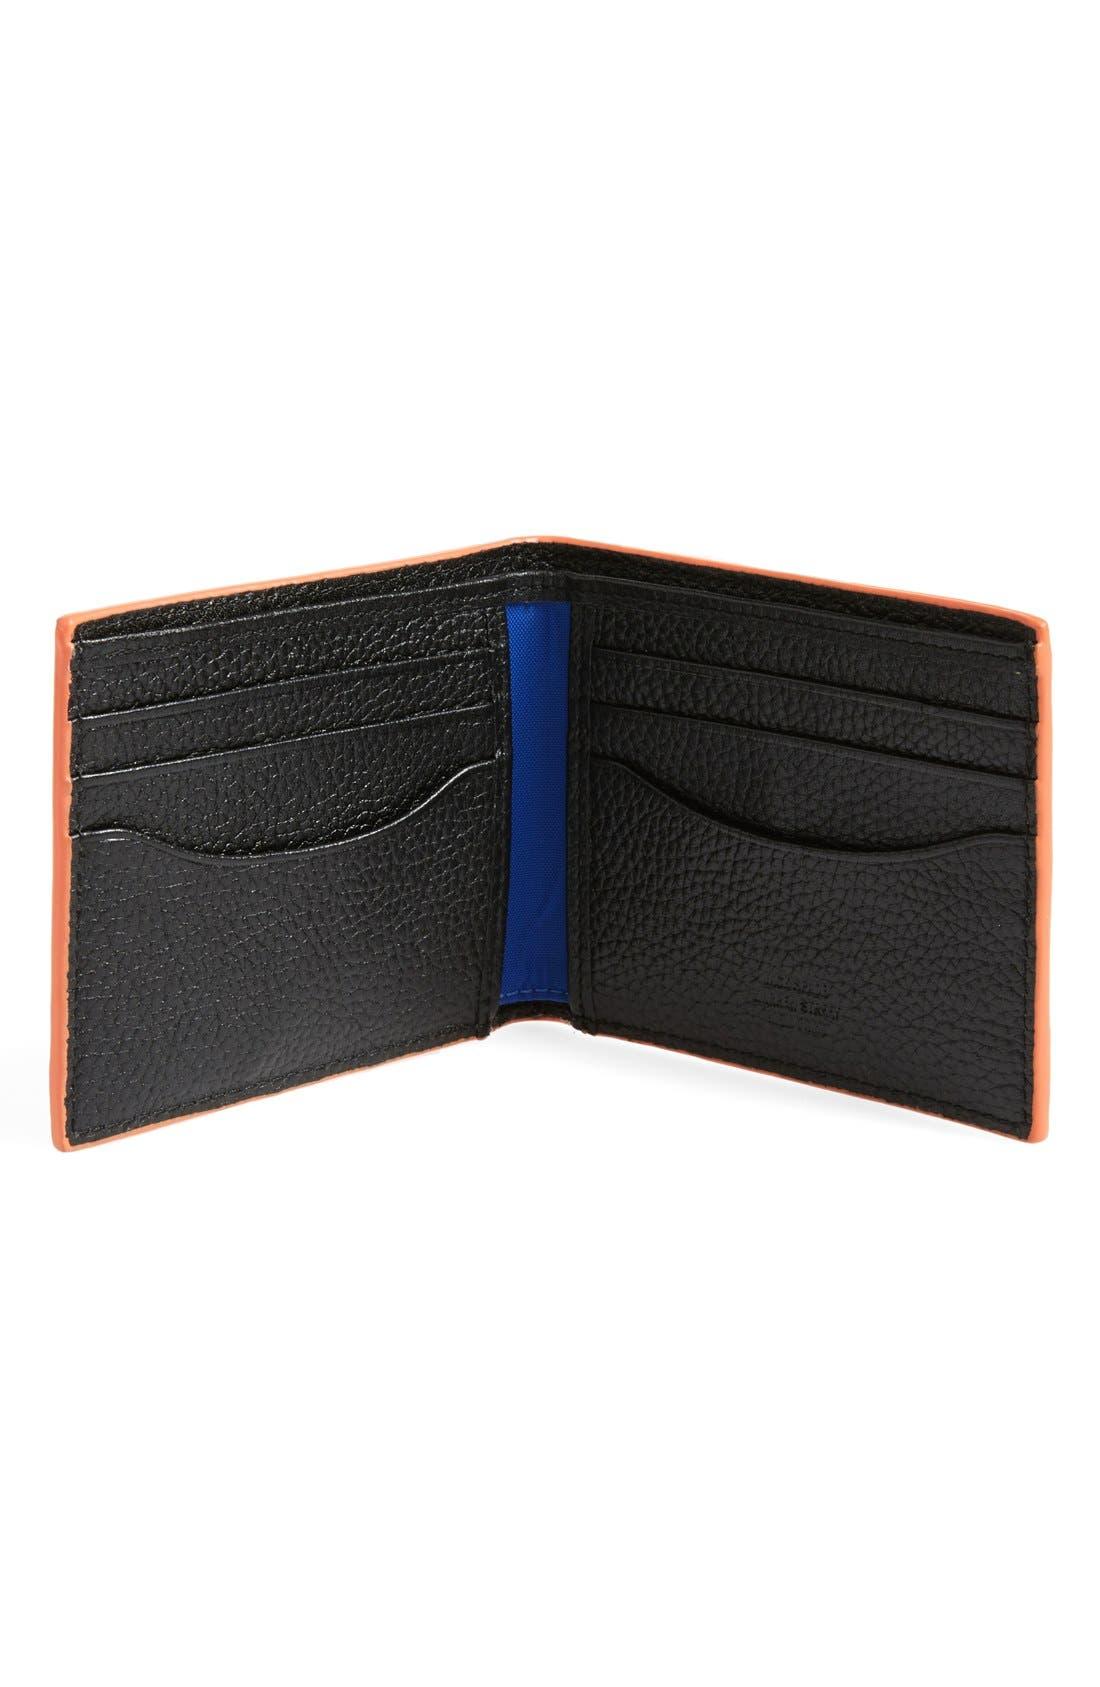 Alternate Image 2  - Jack Spade 'Mason' Leather Wallet